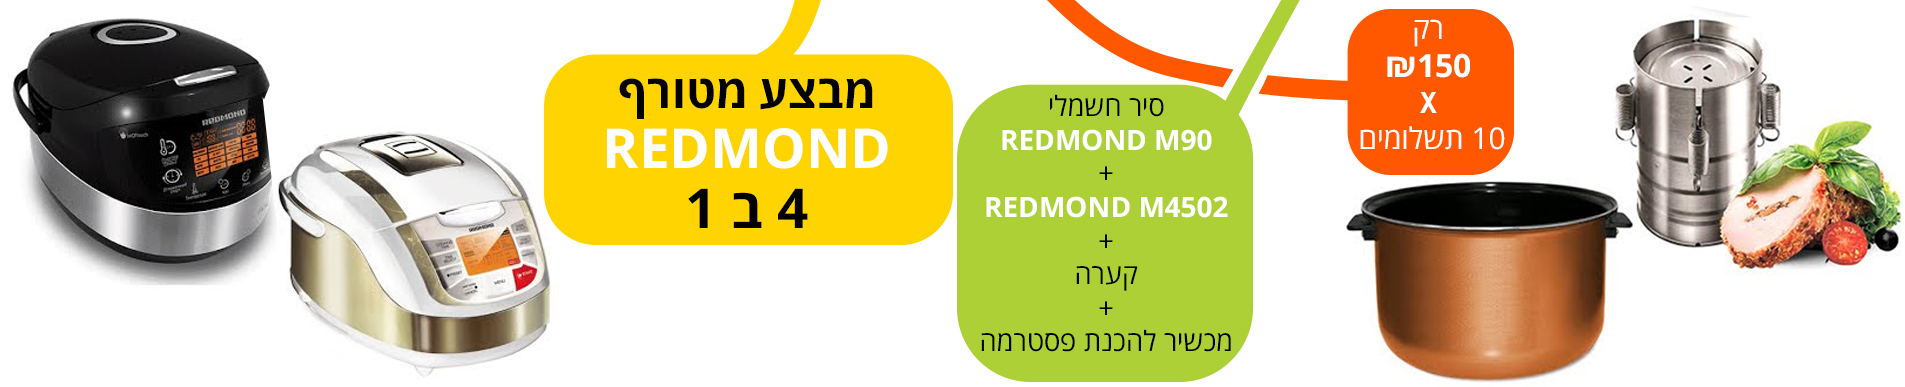 Redmond_new_he